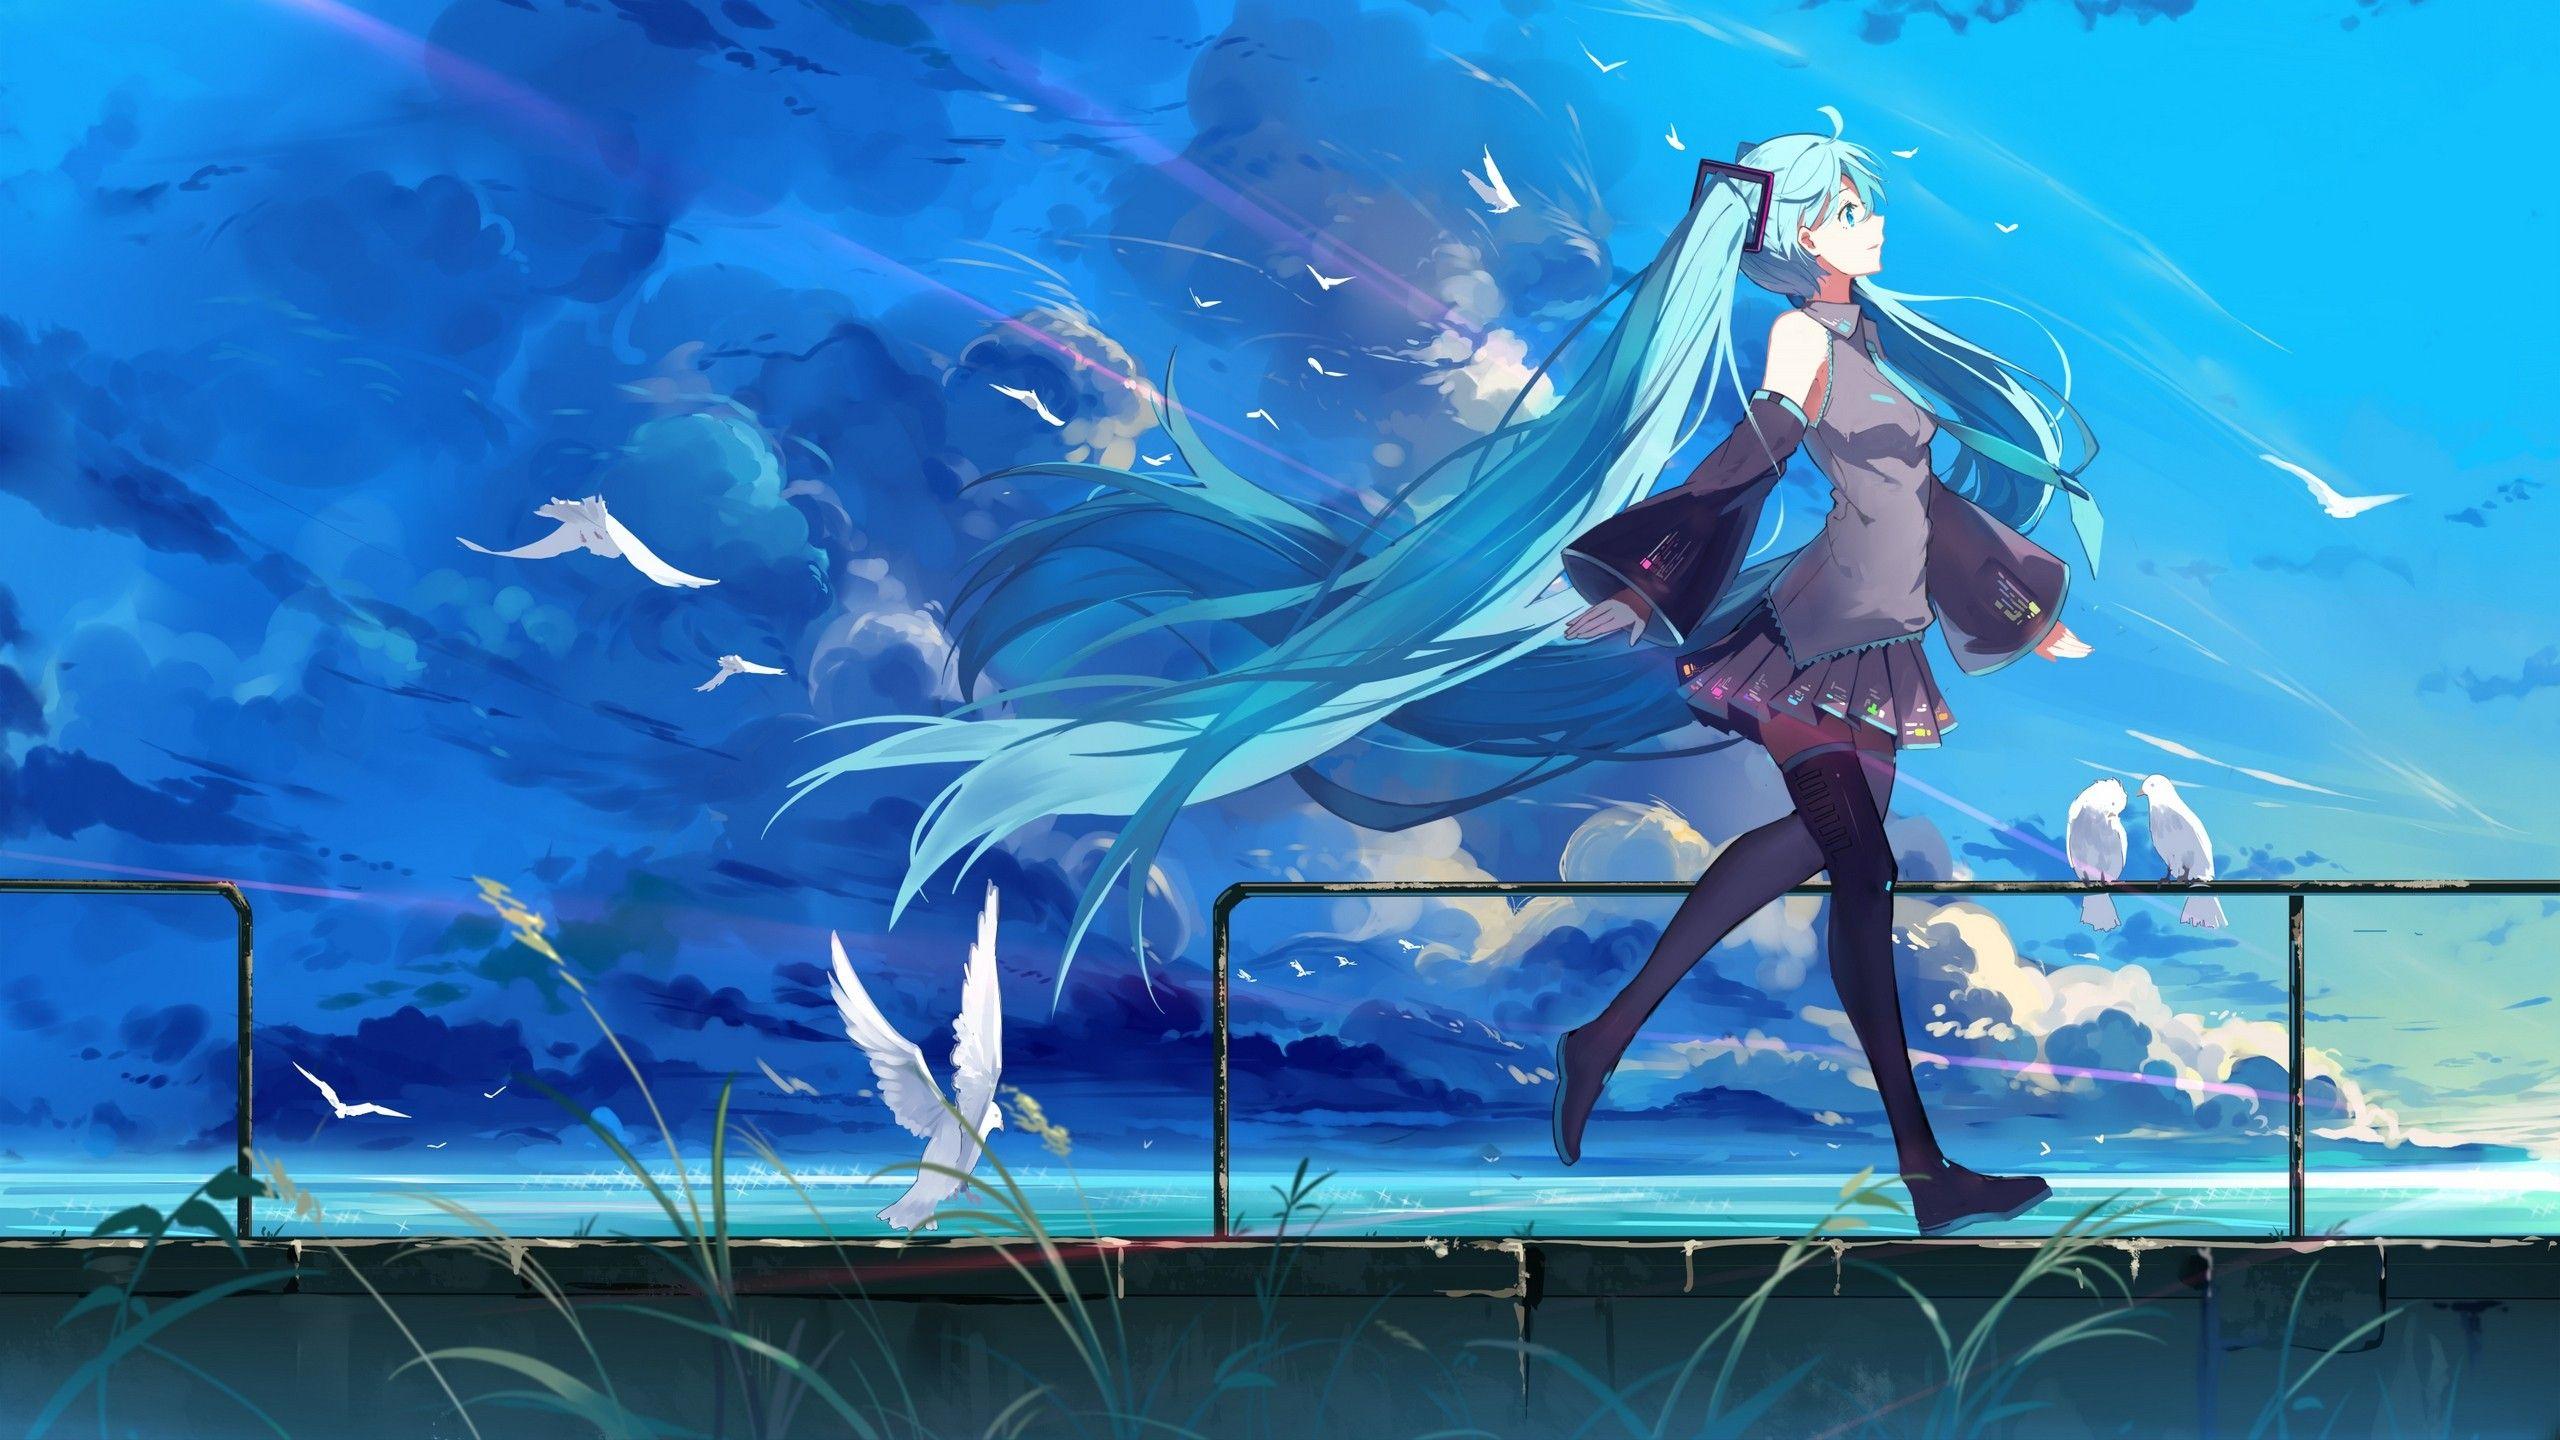 Wallhaven 354650 Jpg 2560 1440 Hatsune Miku Hatsune Kawaii Anime